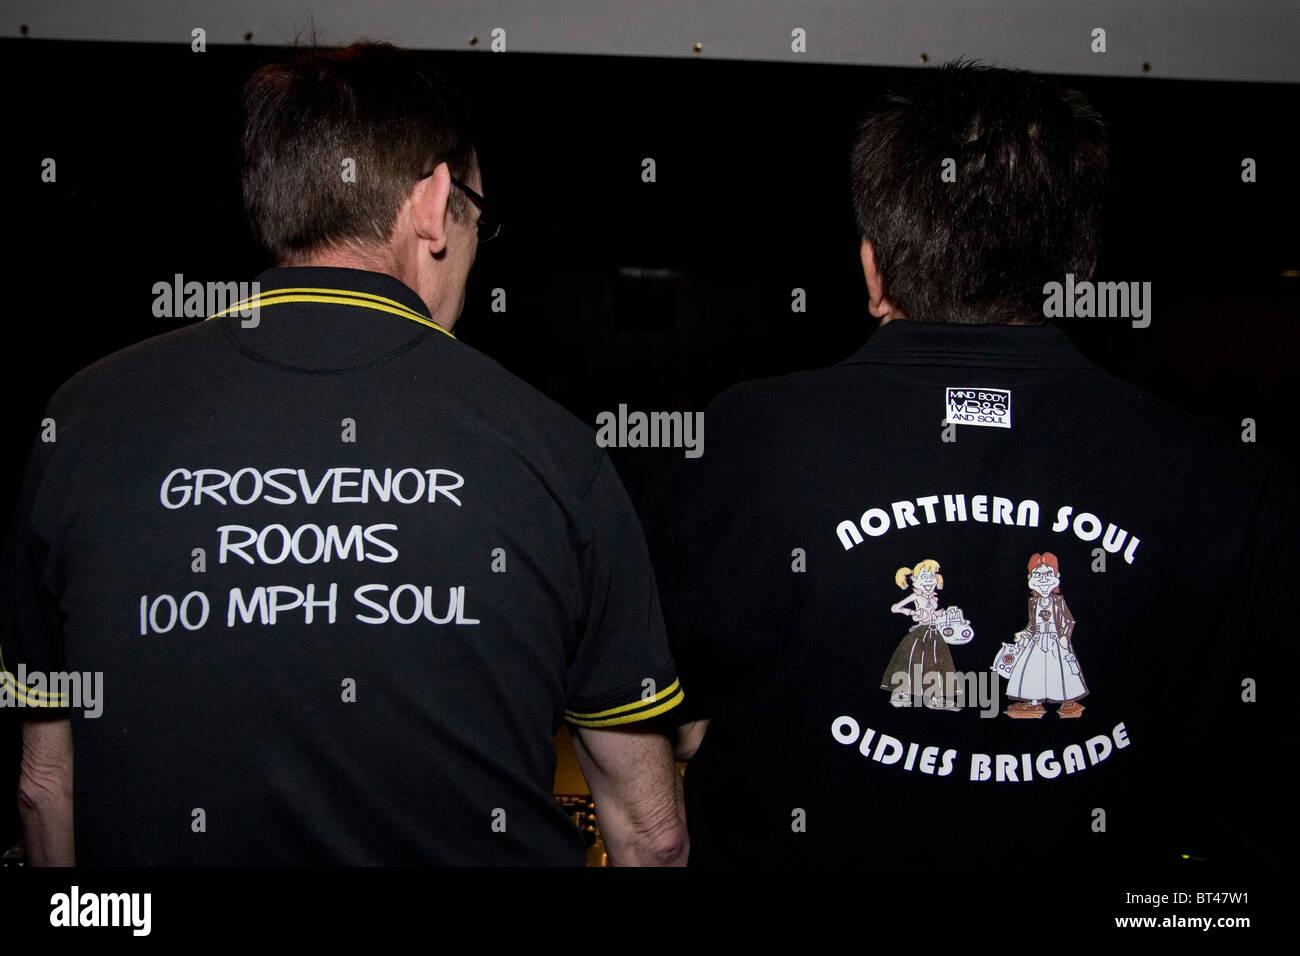 Northern Soul T Shirt Stock Photos & Northern Soul T Shirt